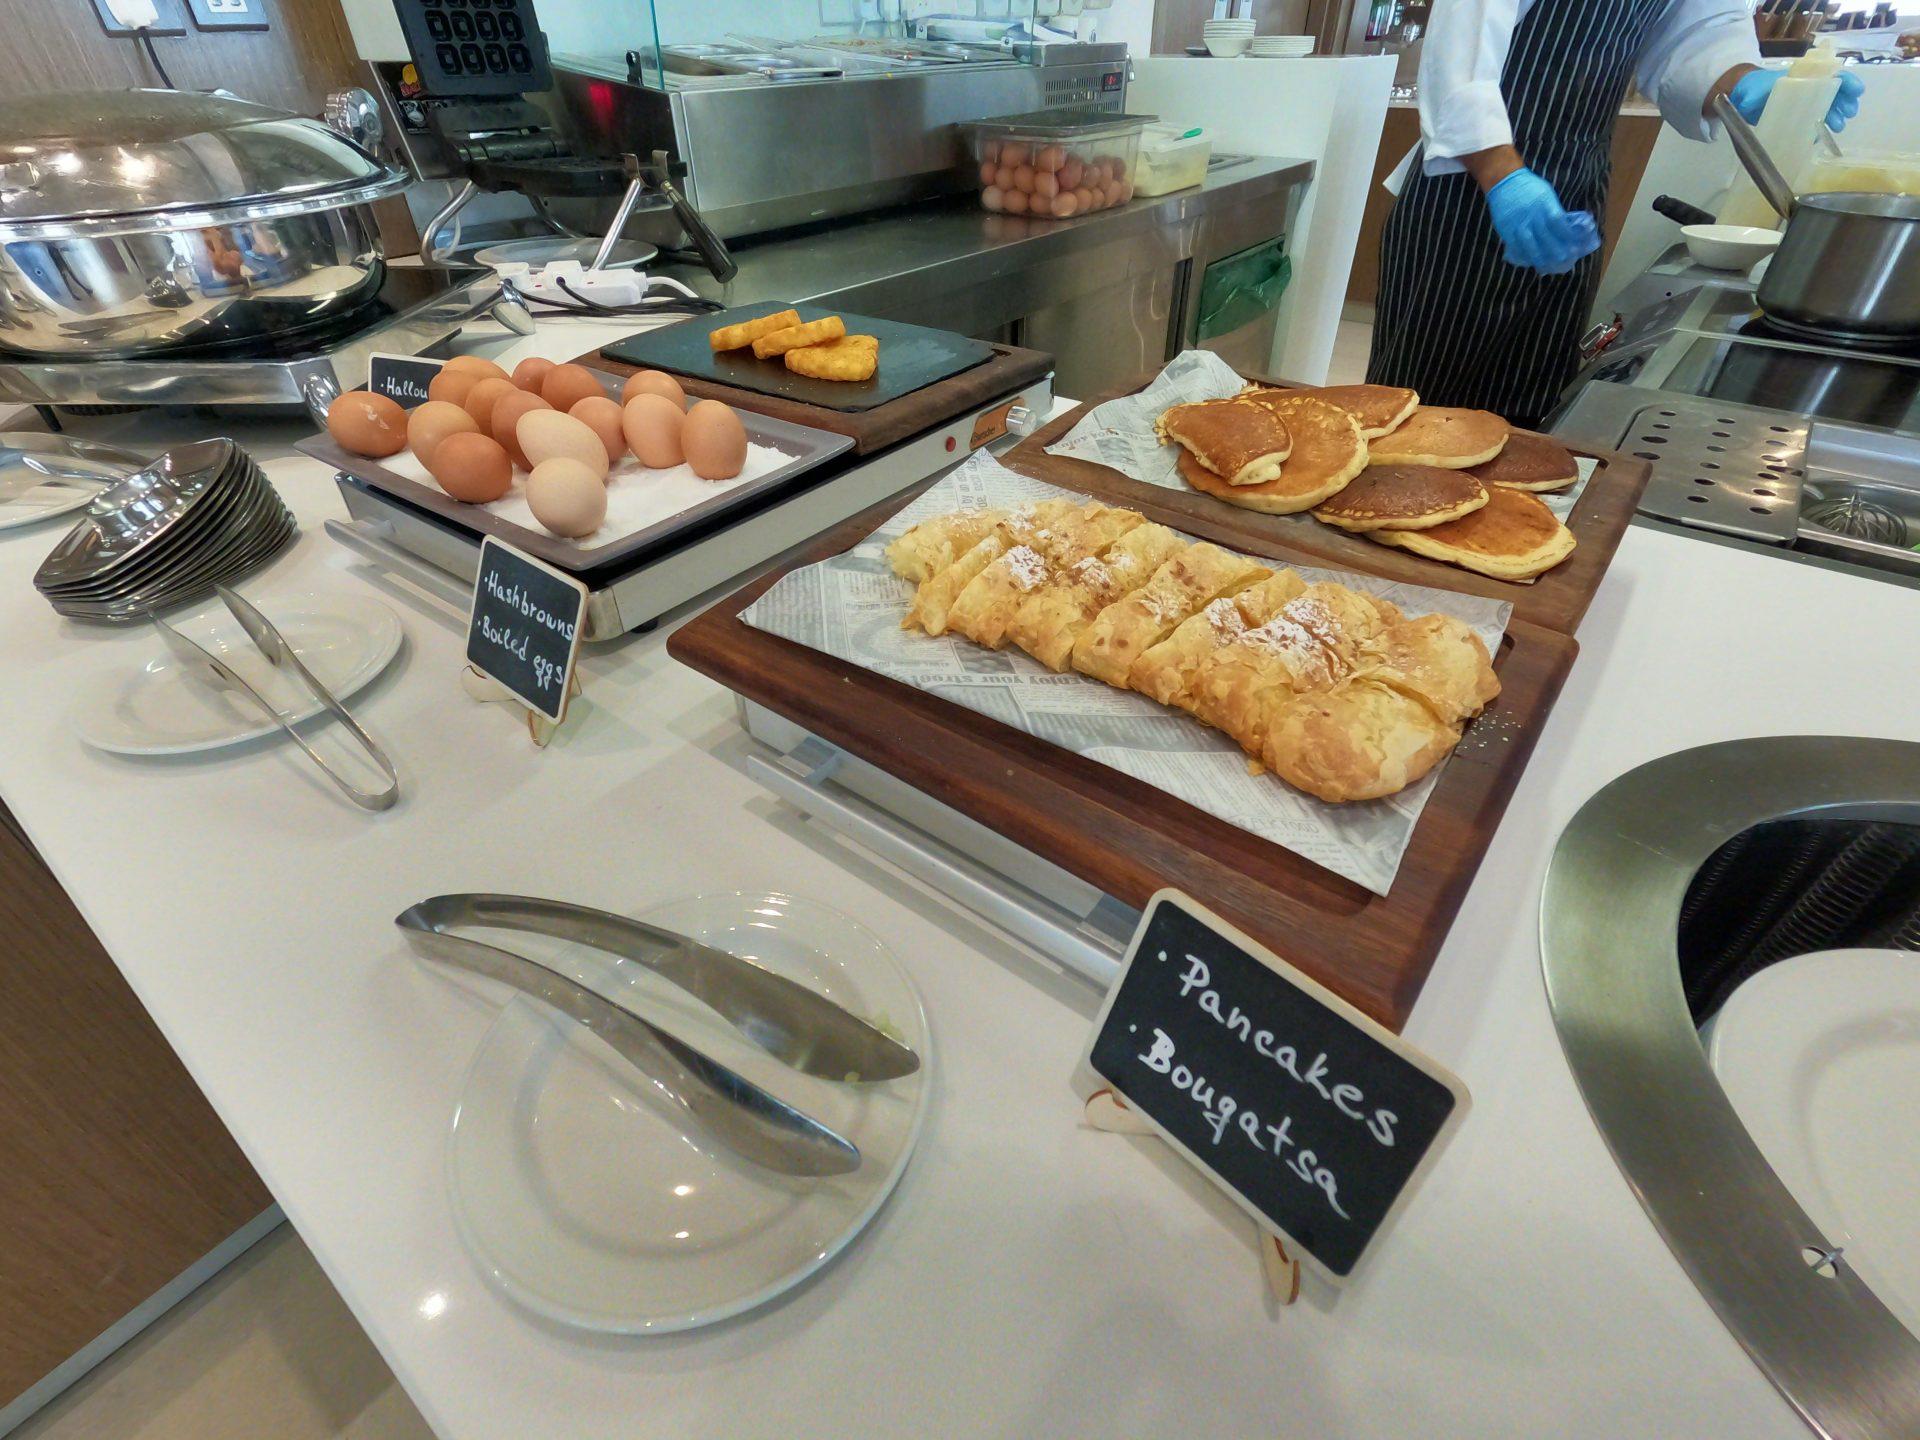 Pancakes, bougatsa (greek pastry), hash browns and boiled eggs